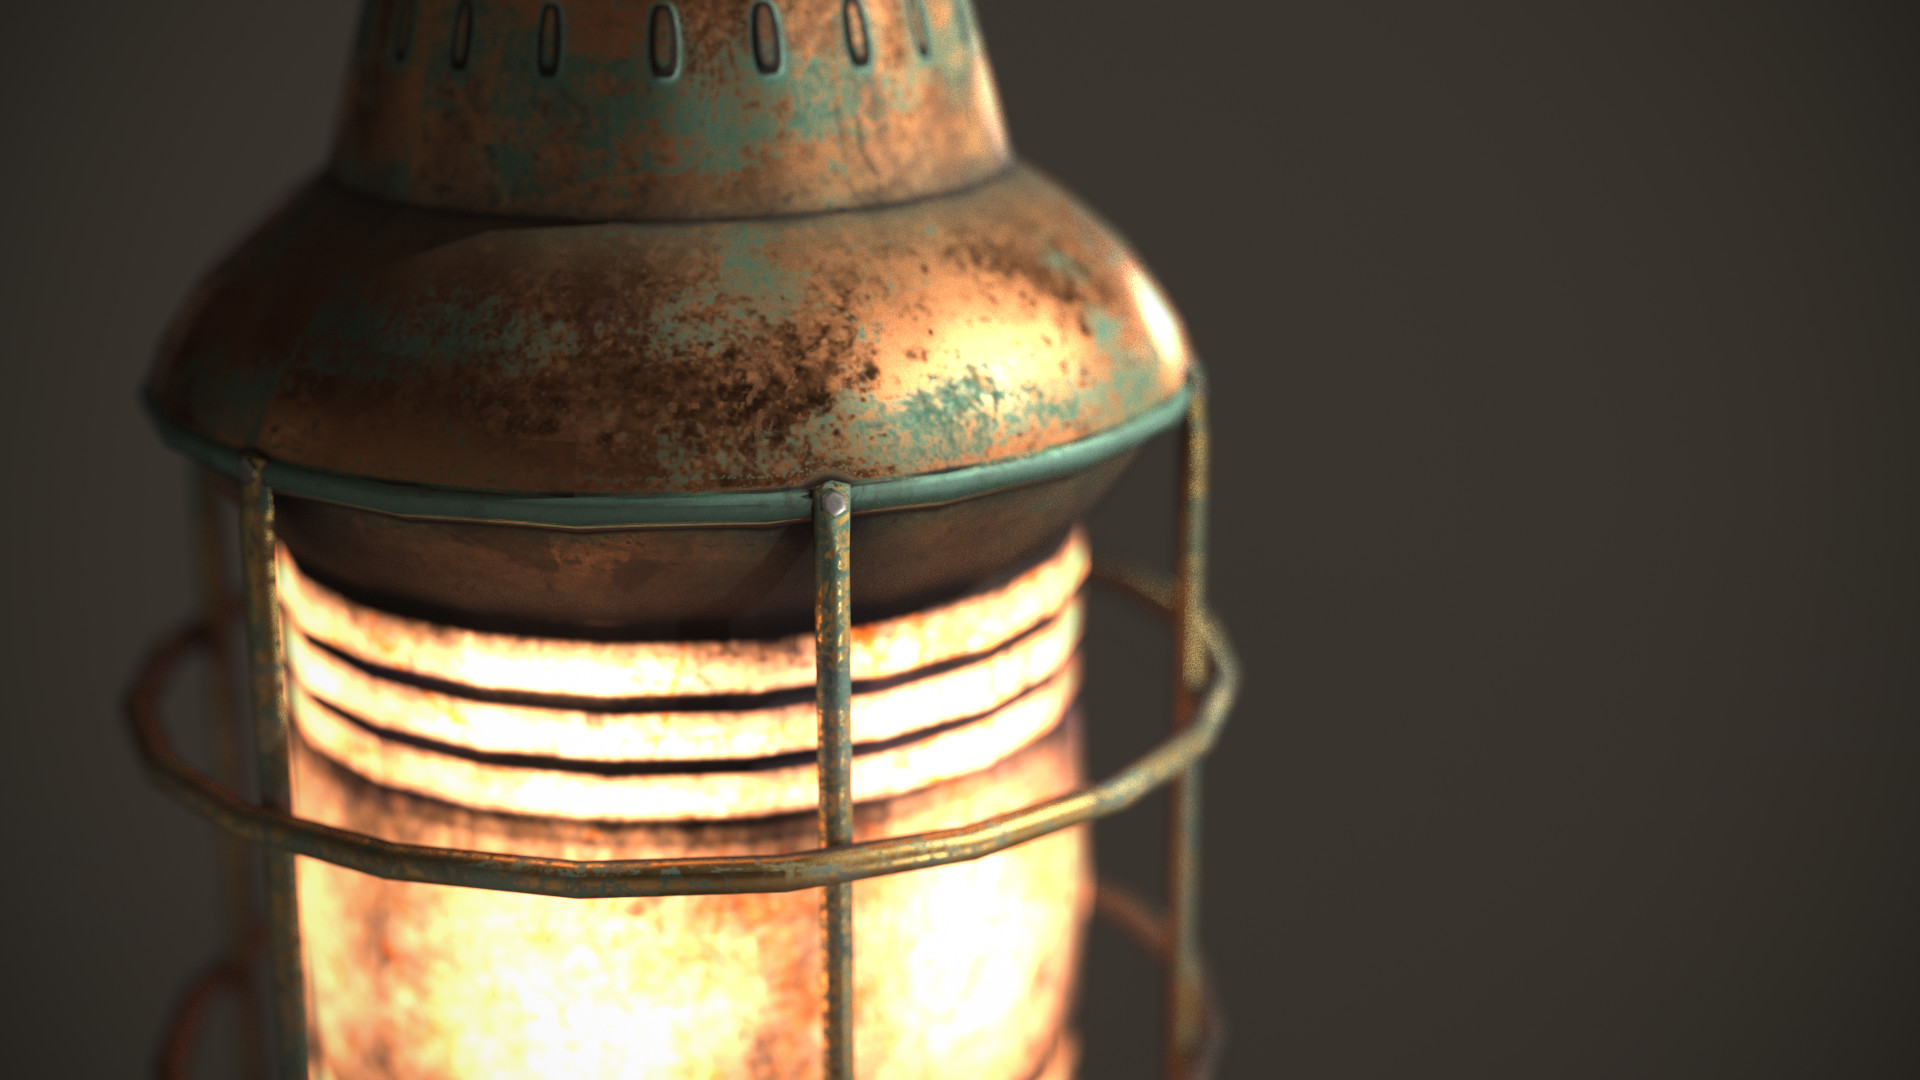 Leonardo iezzi 002 lantern